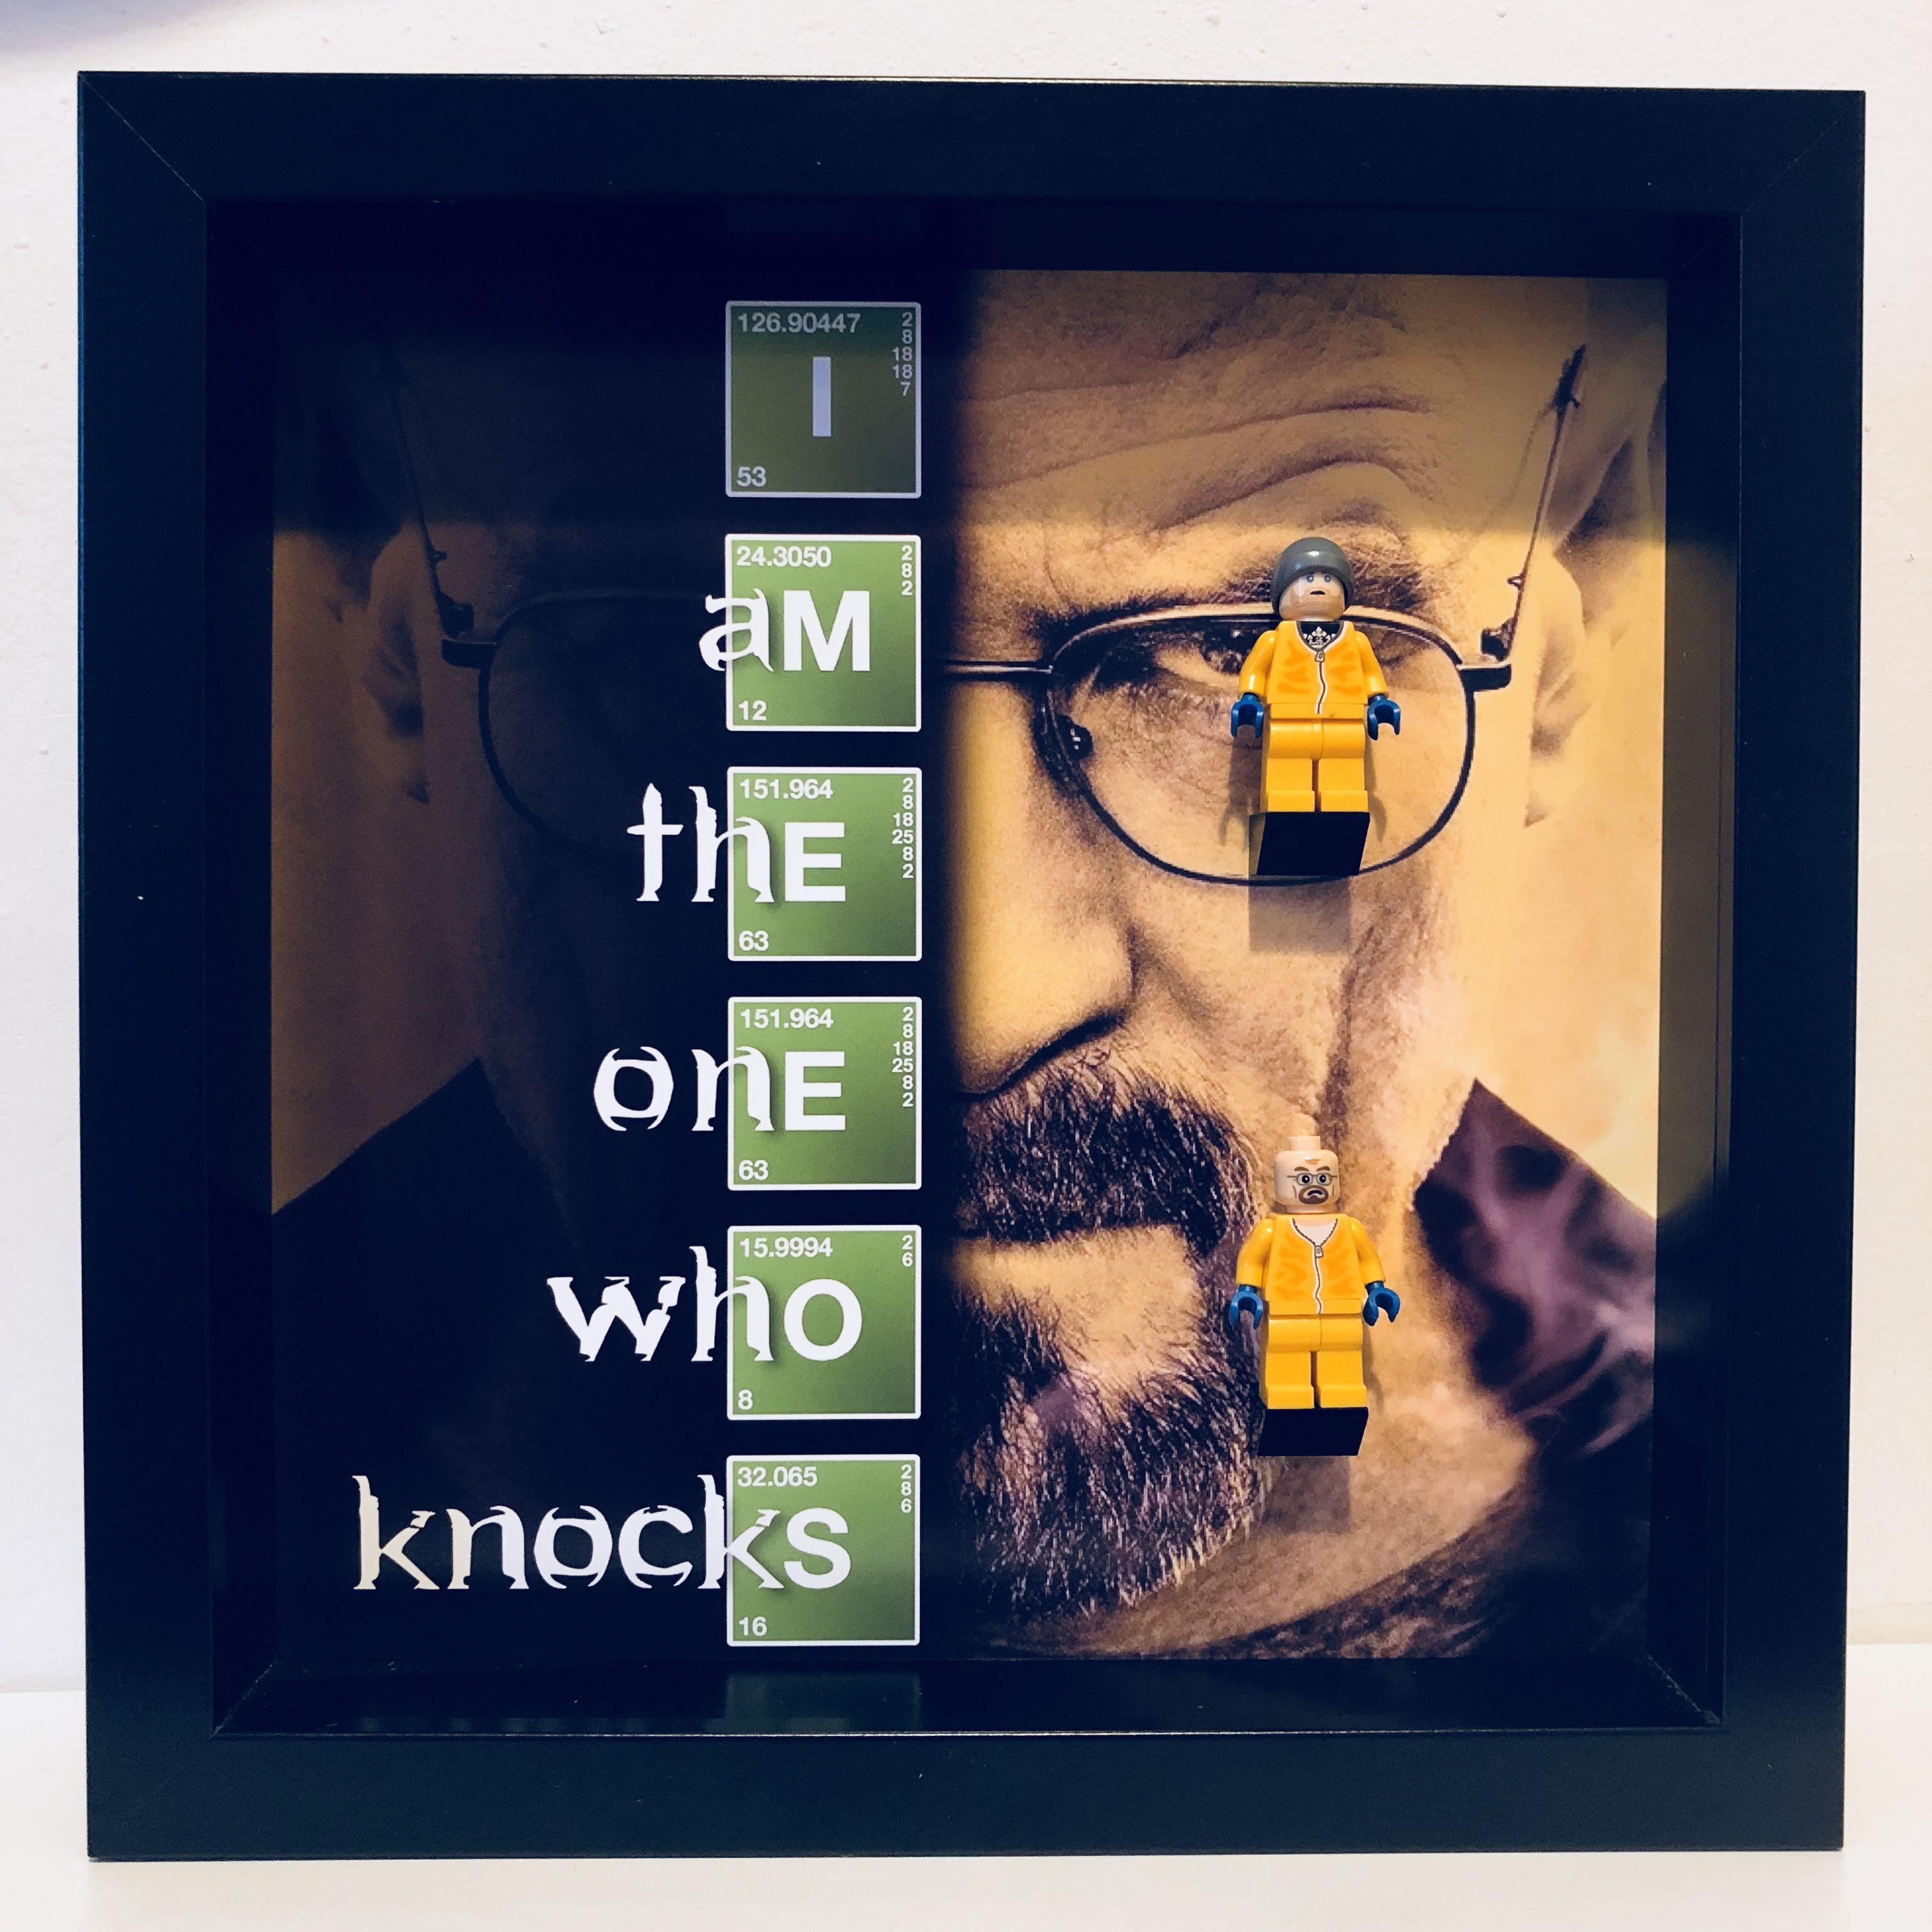 Breaking Bad 2PC Minifigure Frame, Mum, Gift, Geek, Box, Dad, Idea ...